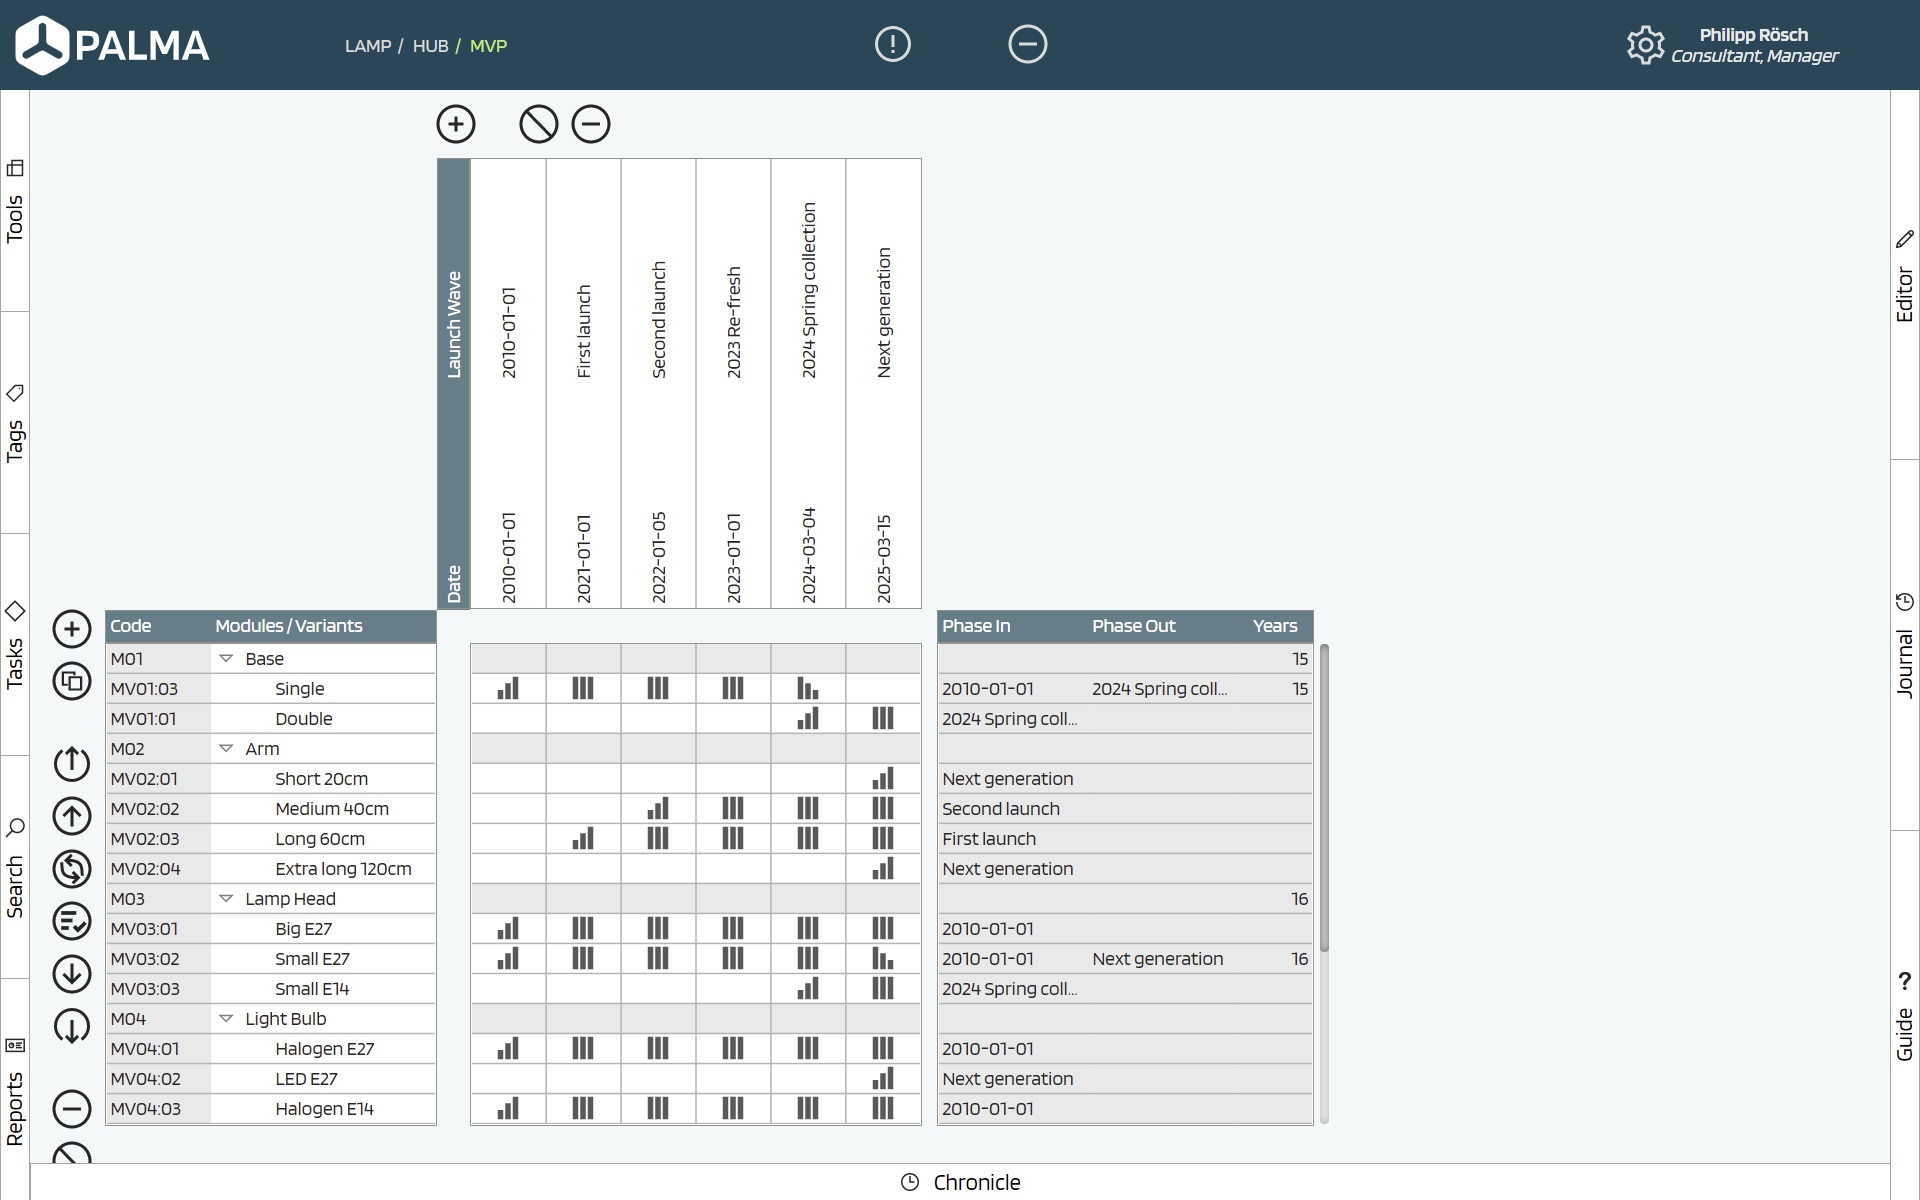 Modularisierung-Software-release-plan